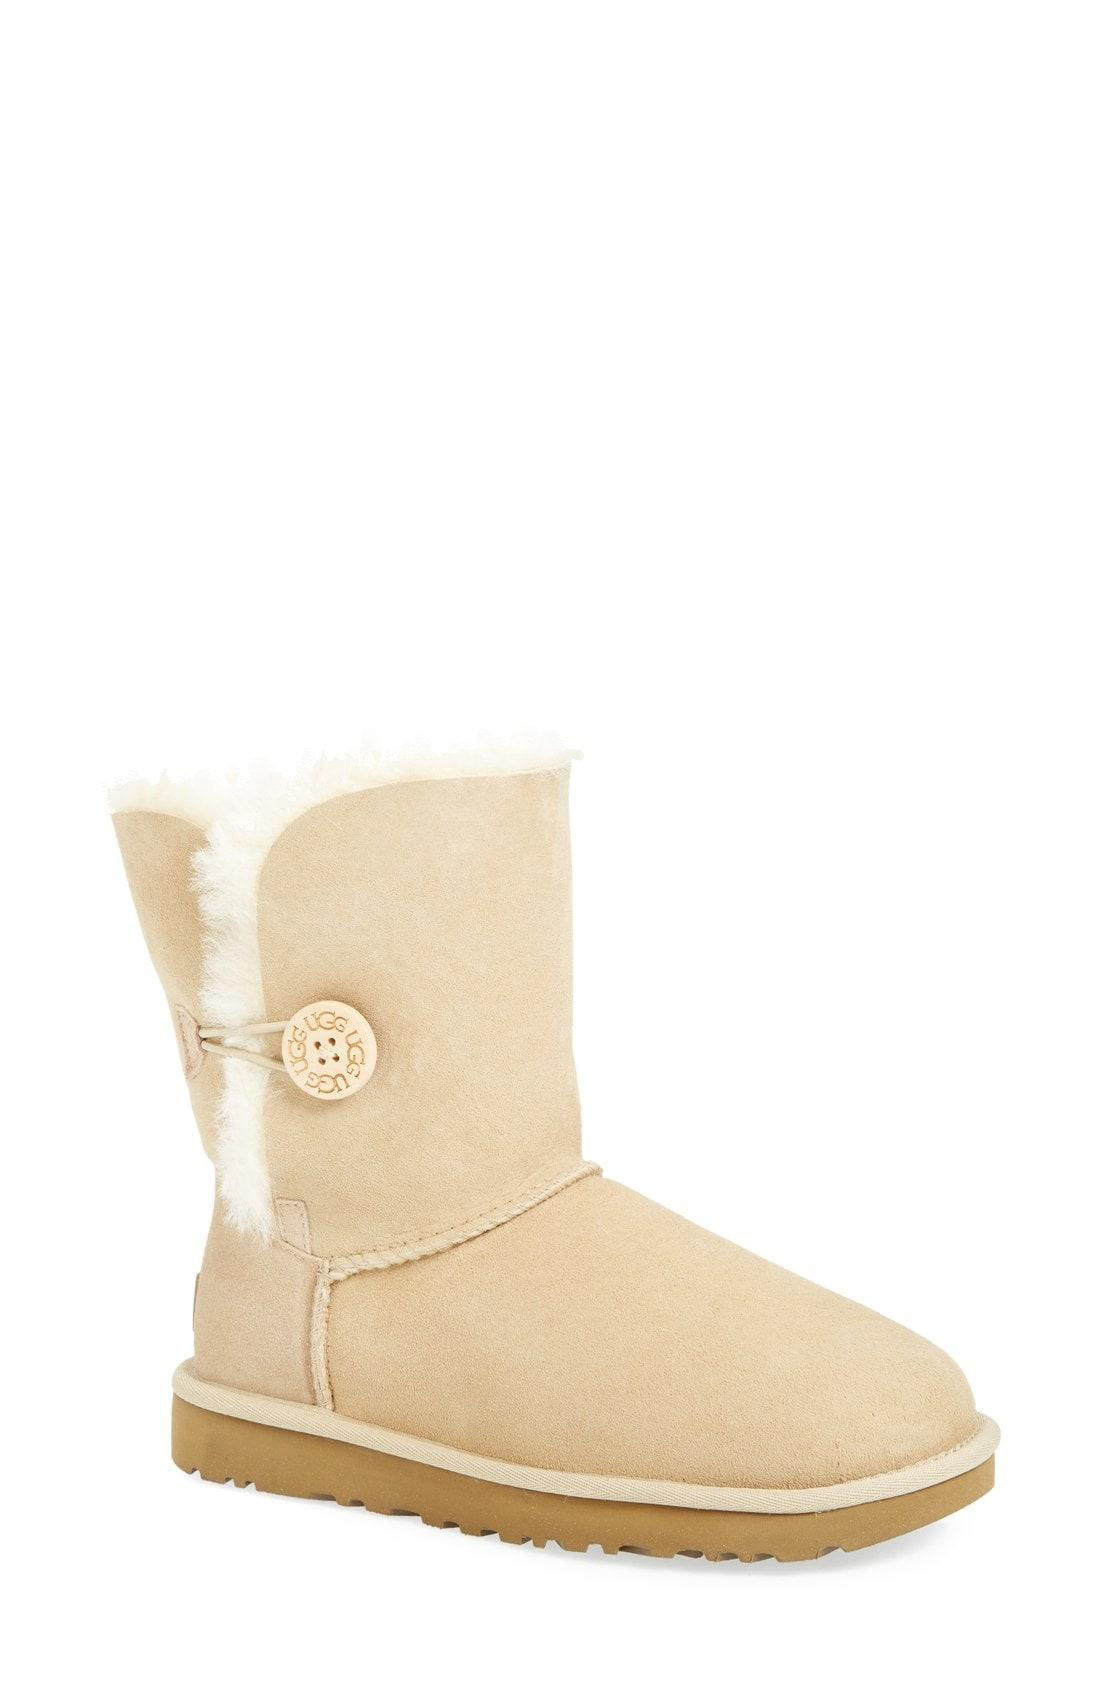 b6de4d6c074 Lyst - UGG Ugg Bailey Button Ii Boot in Natural